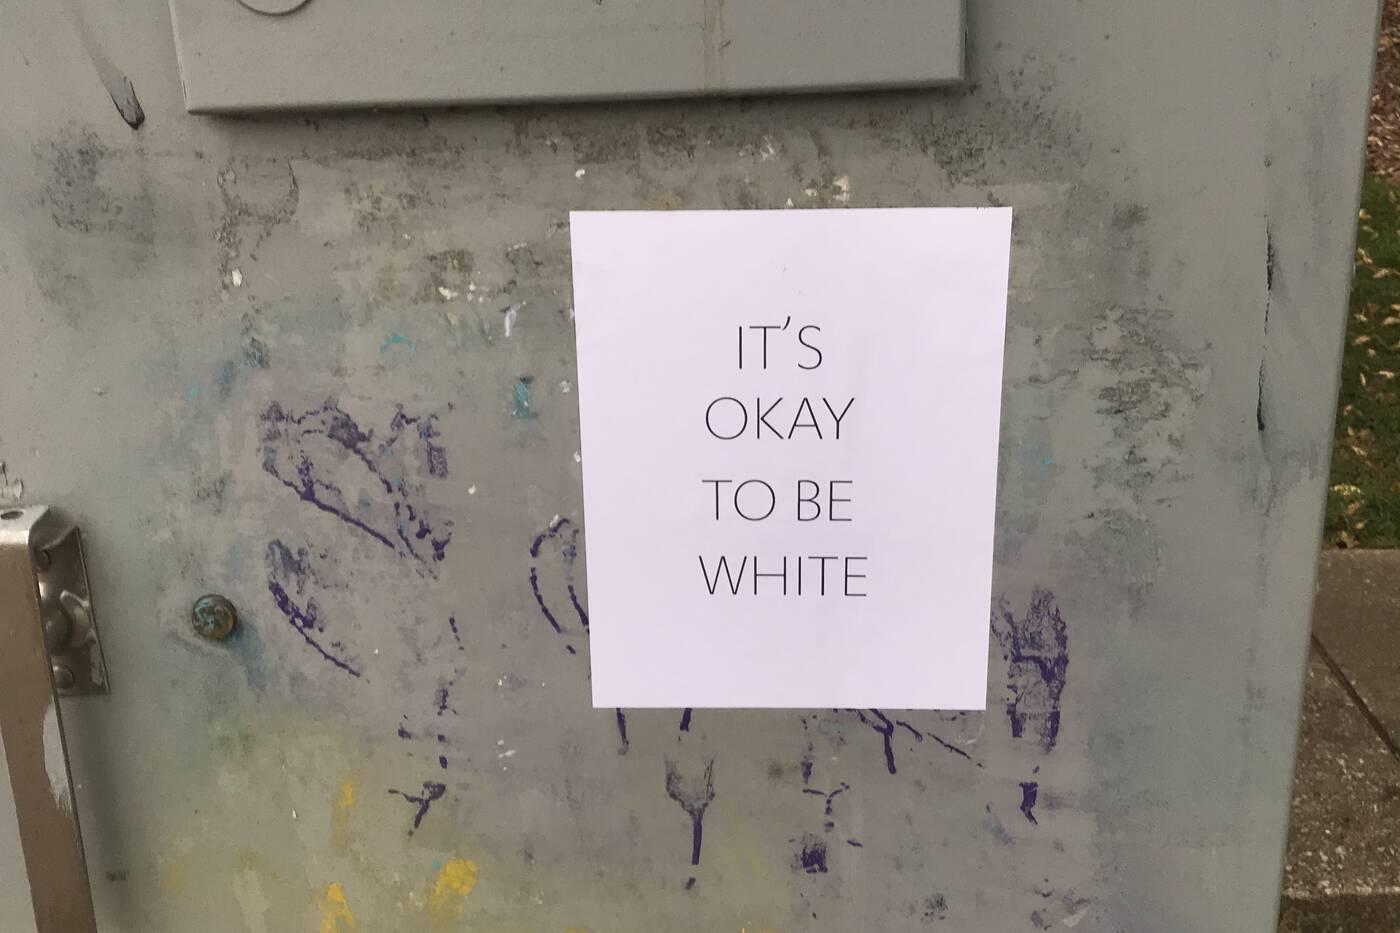 Racist signs Toronto